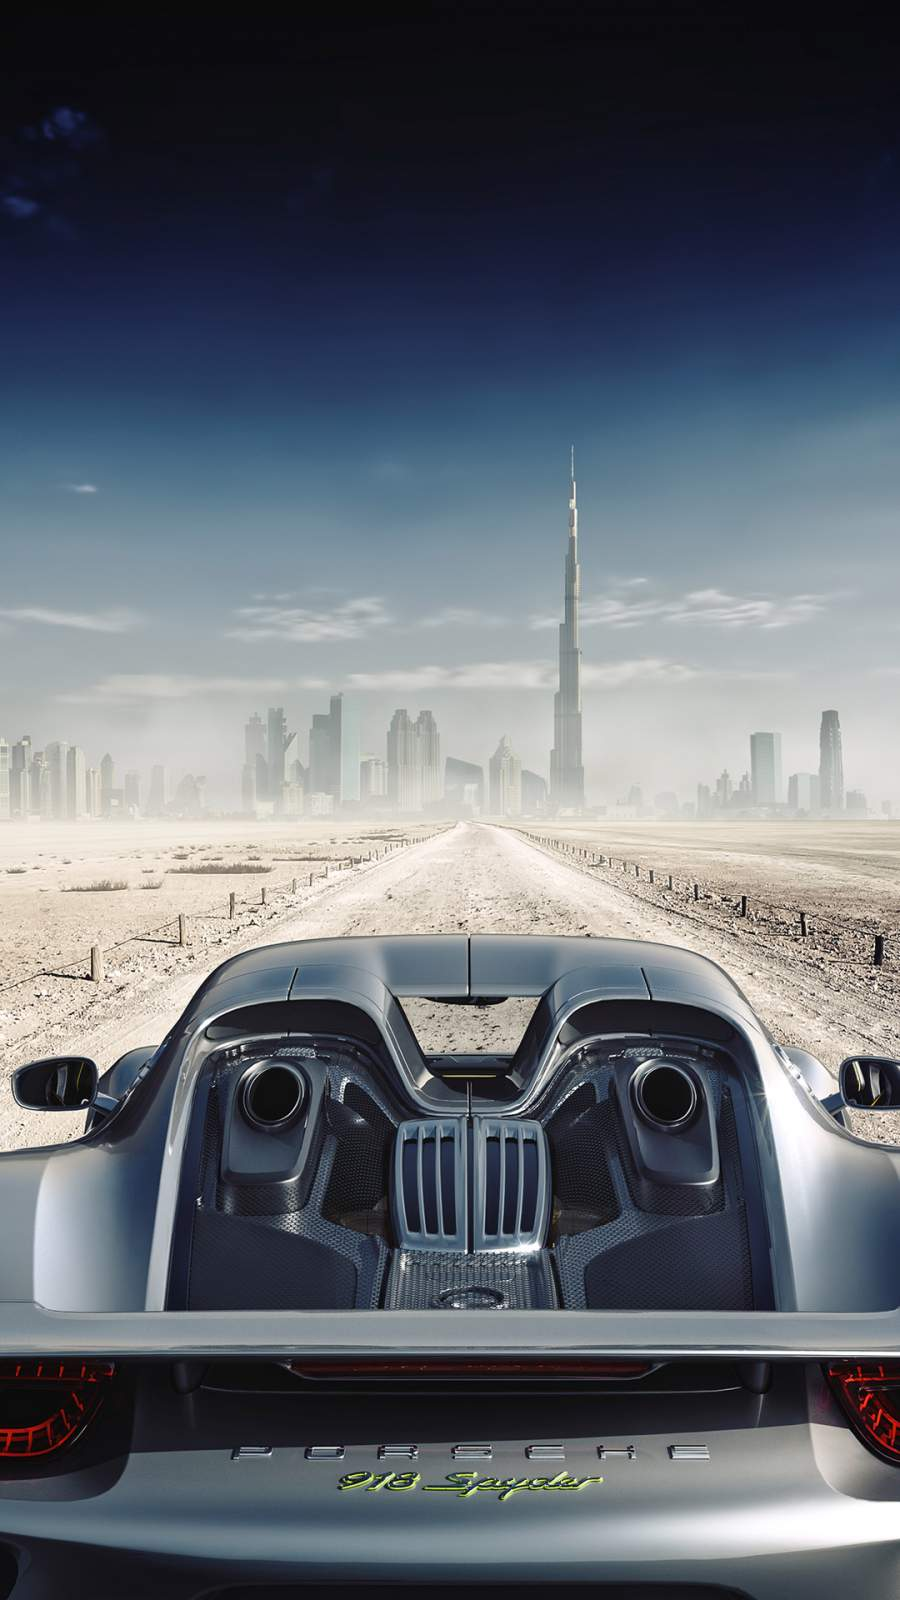 Porsche Spyder in Dubai iPhone Wallpaper